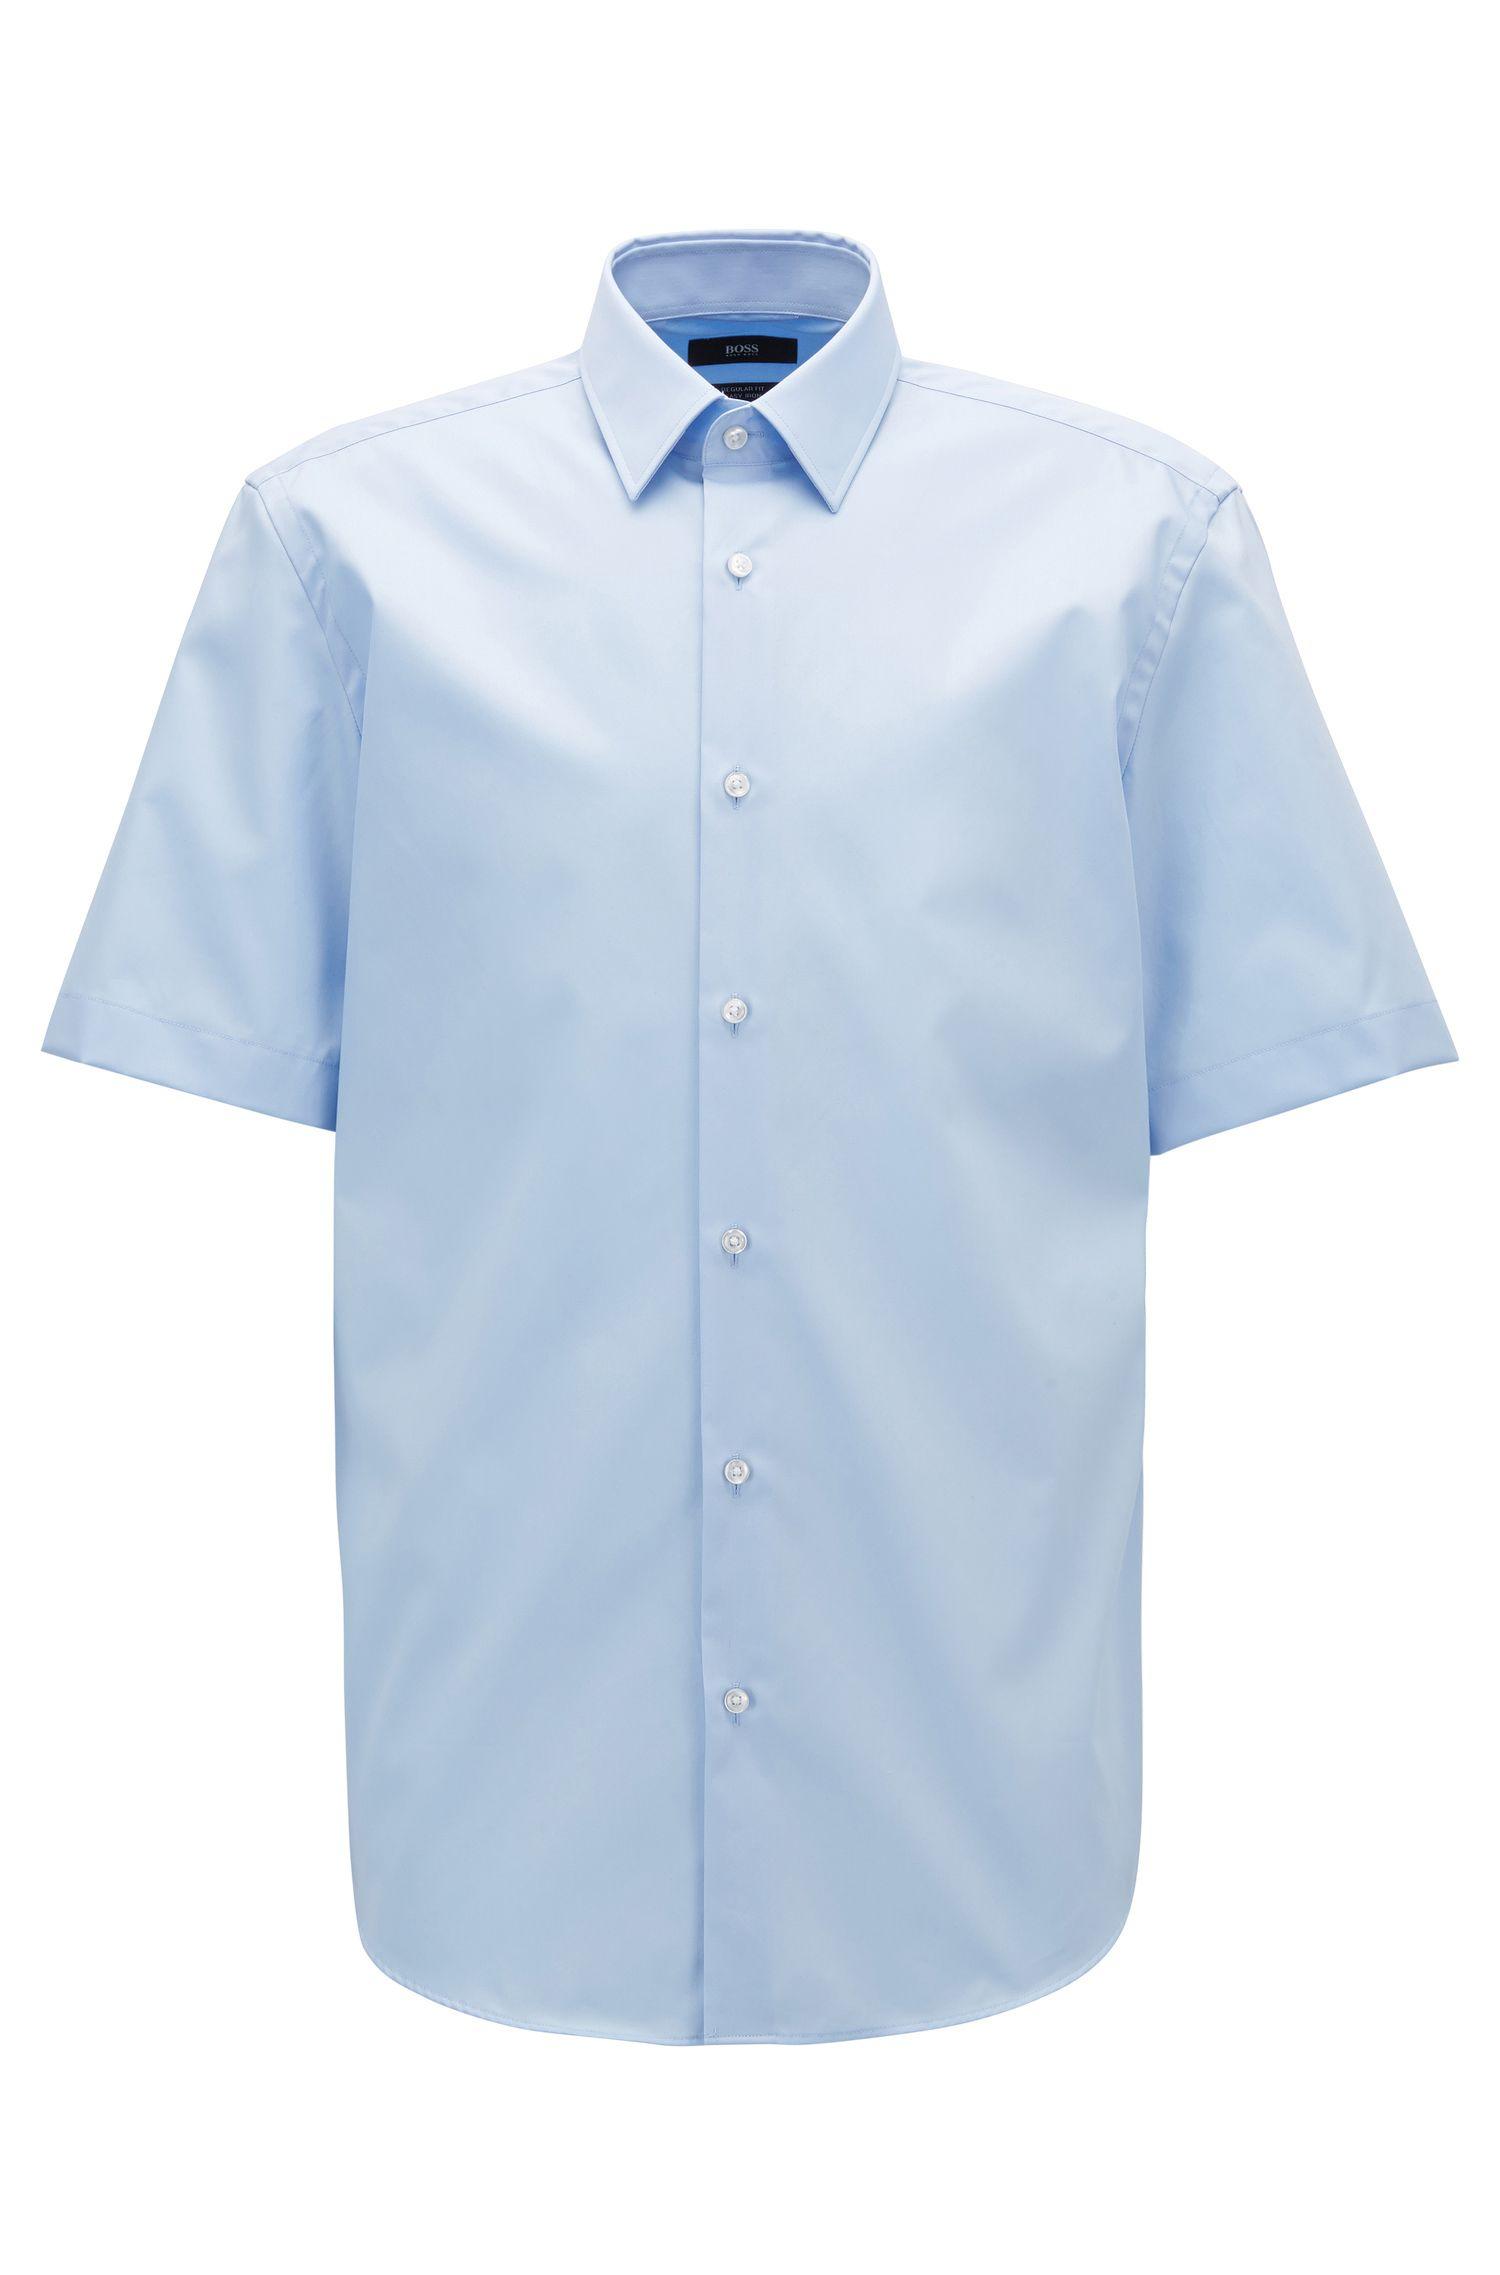 Regular-Fit Kurzarm-Hemd aus bügelleichter Baumwoll-Popeline